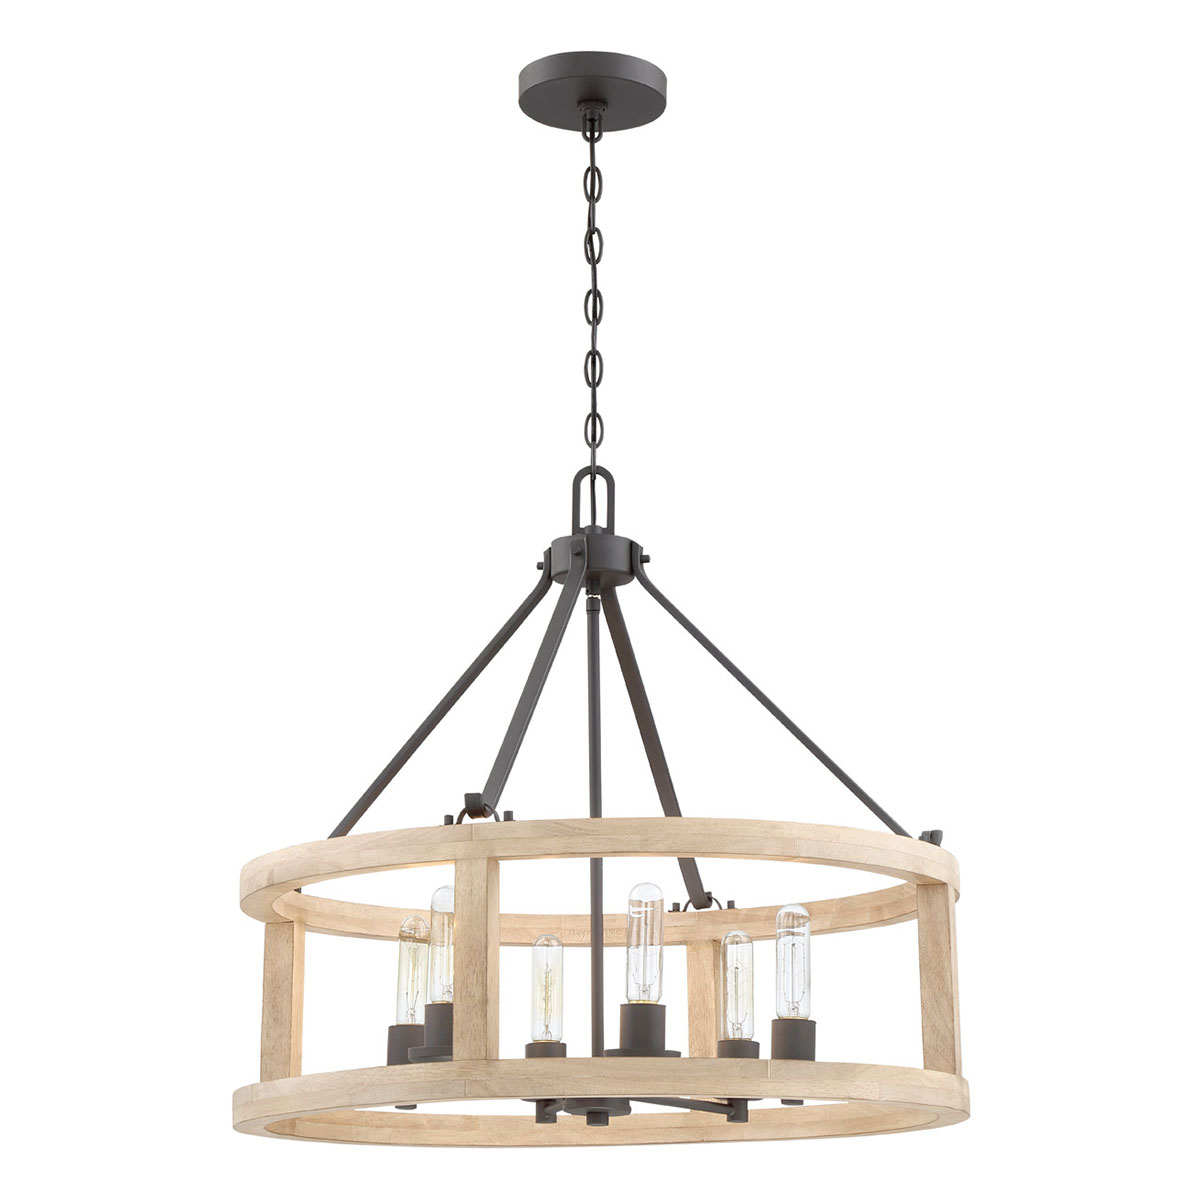 Large Pendant Lights For Foyer Australia : Atwood light large pendant